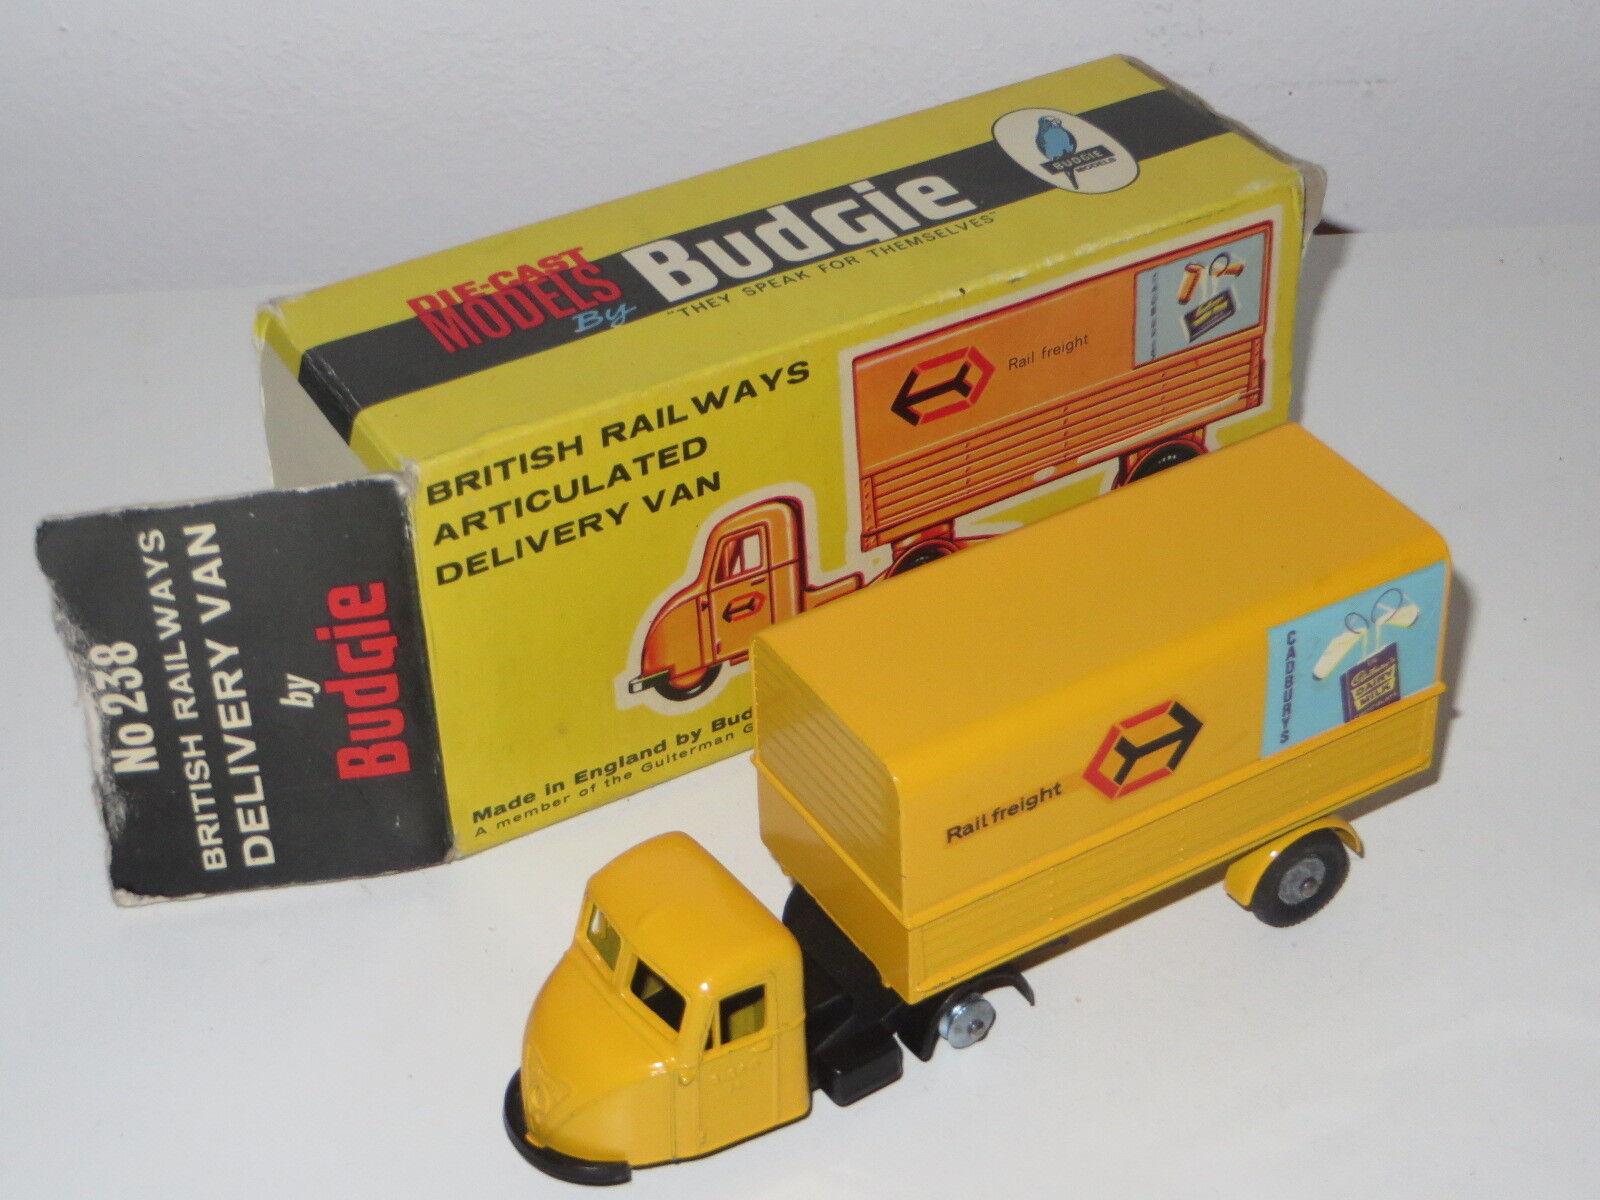 Budgie TOYS 238 British Railways articolato consegna Van in scatola anni 1960 RAIL